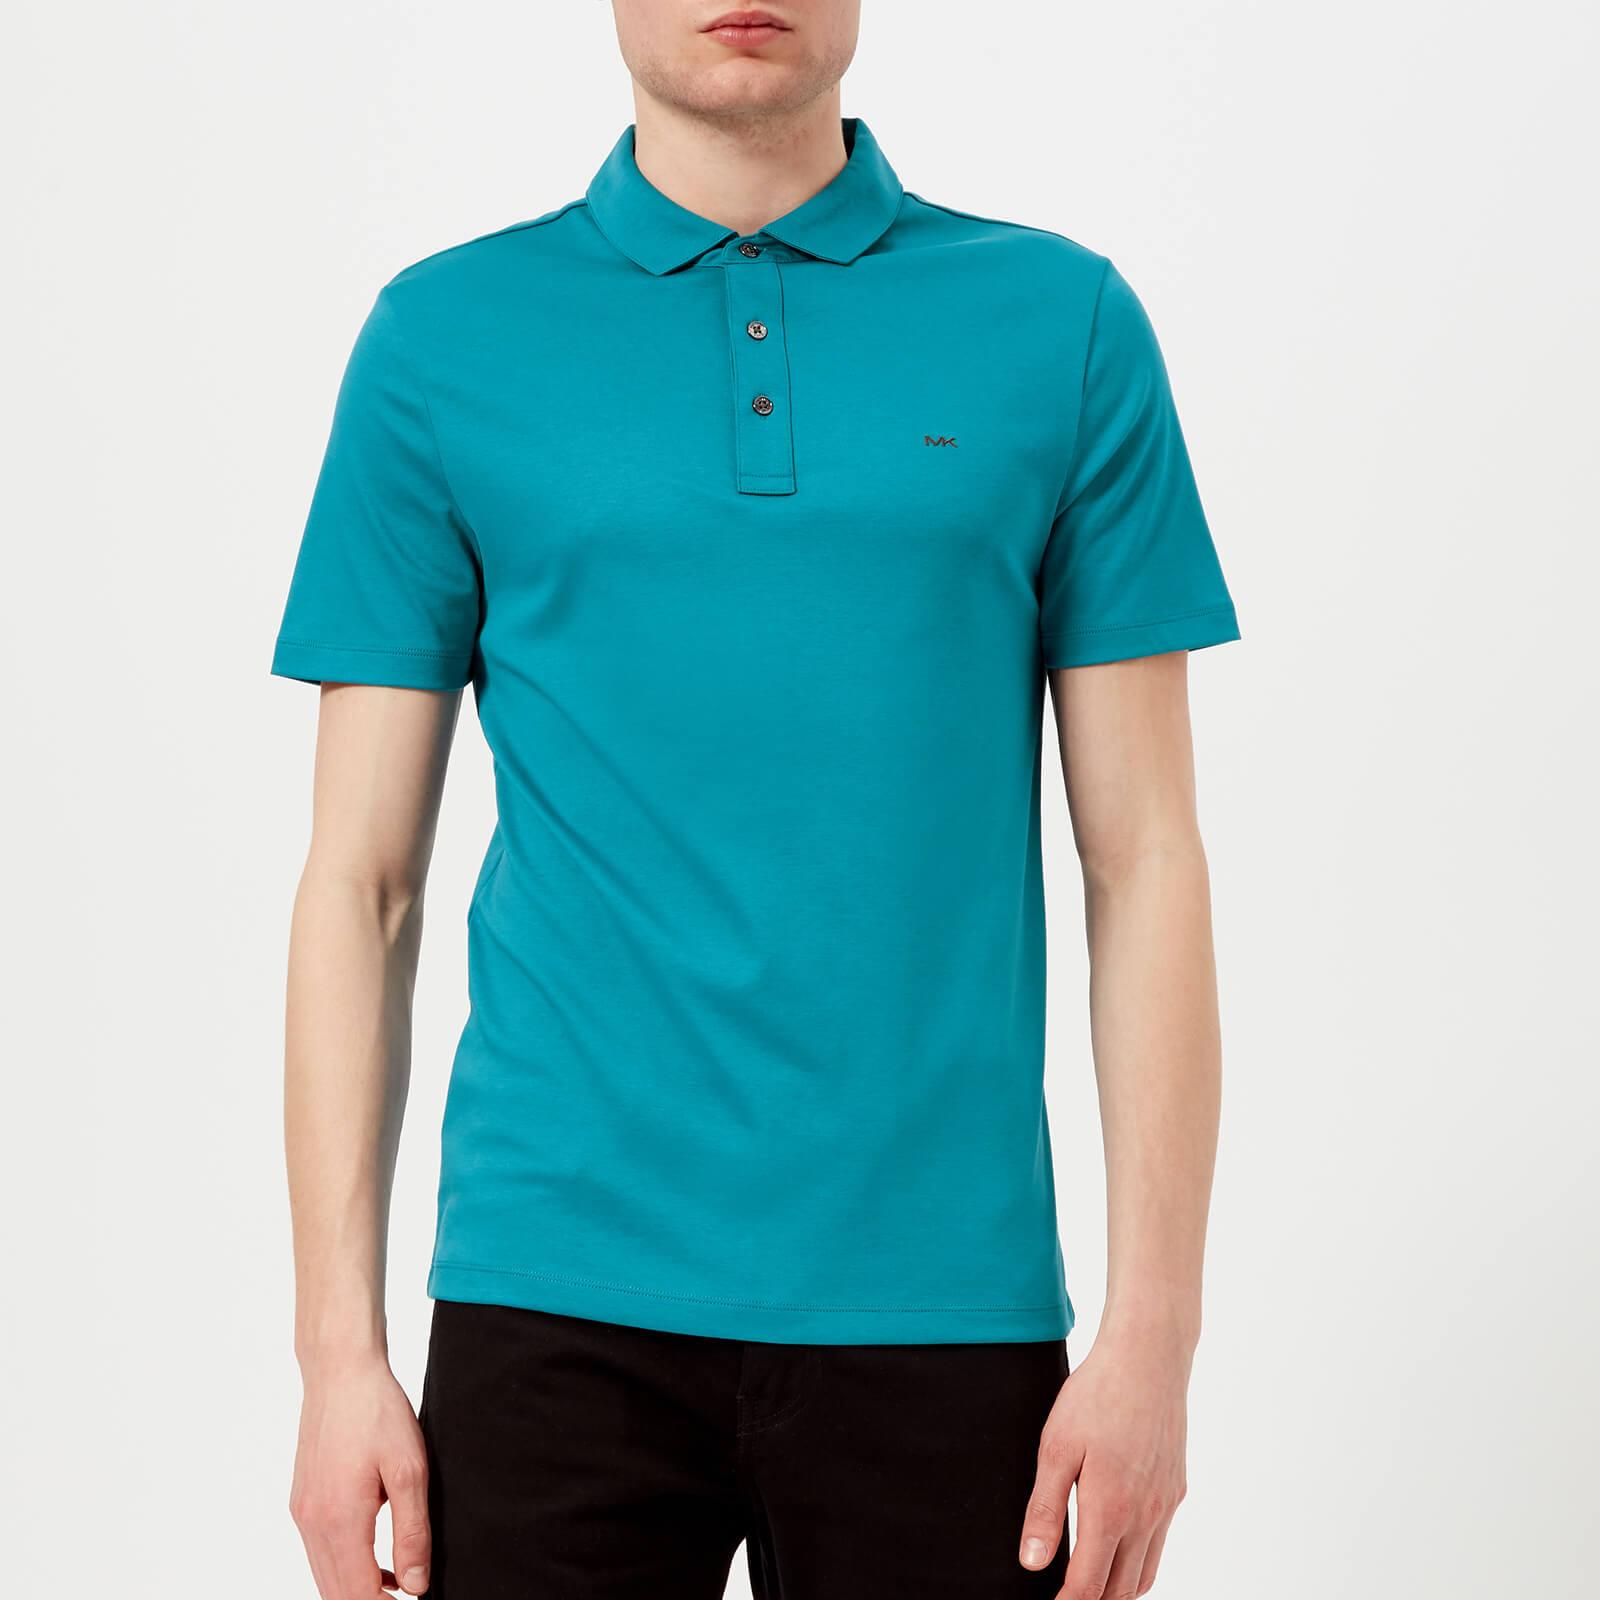 fda61eaa Michael Kors Men's Liquid Jersey Short Sleeve Polo Shirt - Coast Blue  Clothing | TheHut.com